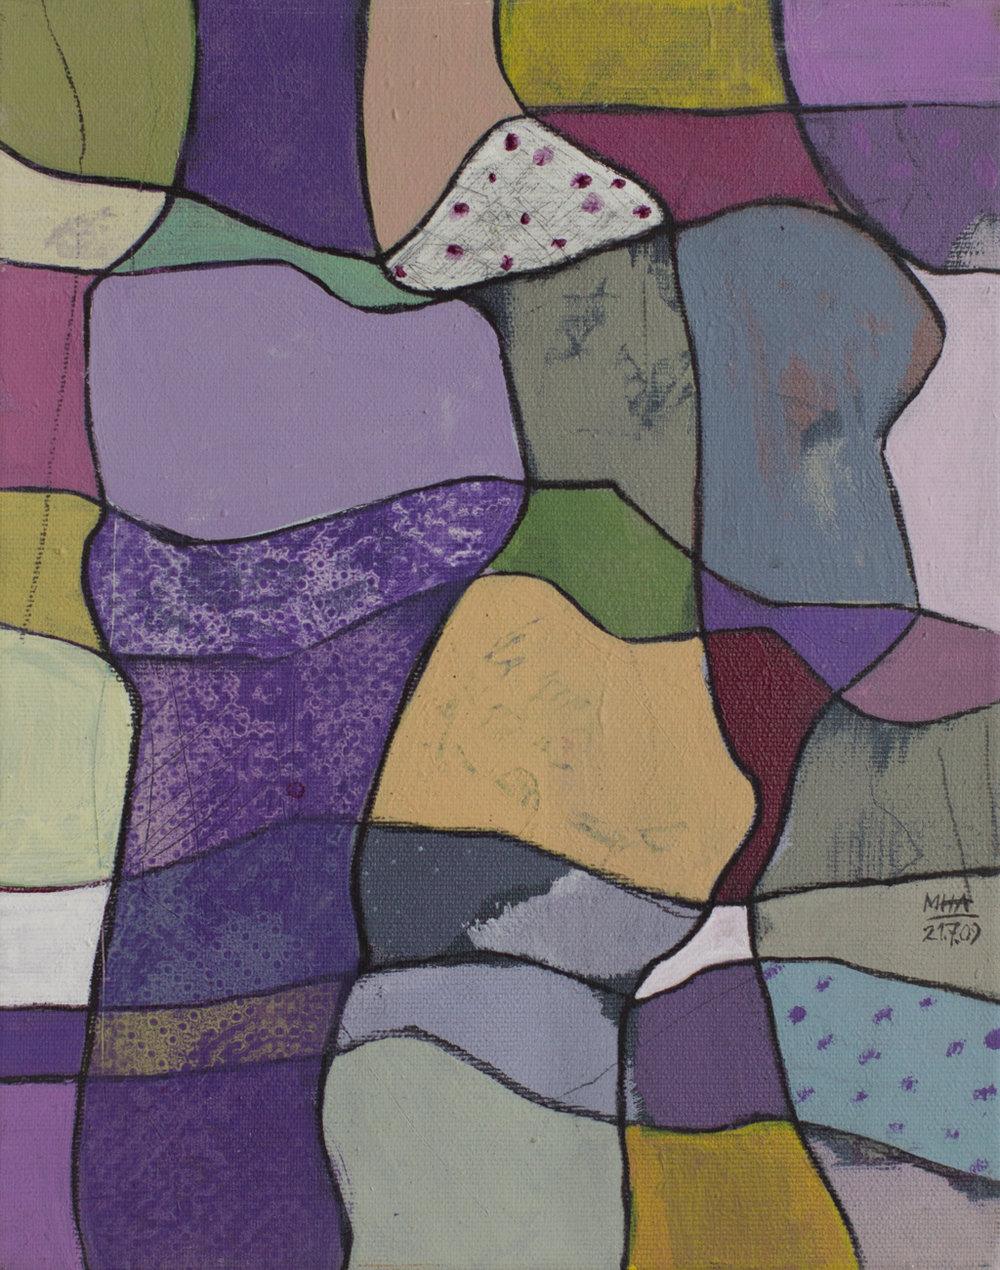 Fantasie in Linien 7 , 2009,Acryl auf Leinwand, 24x30 cm